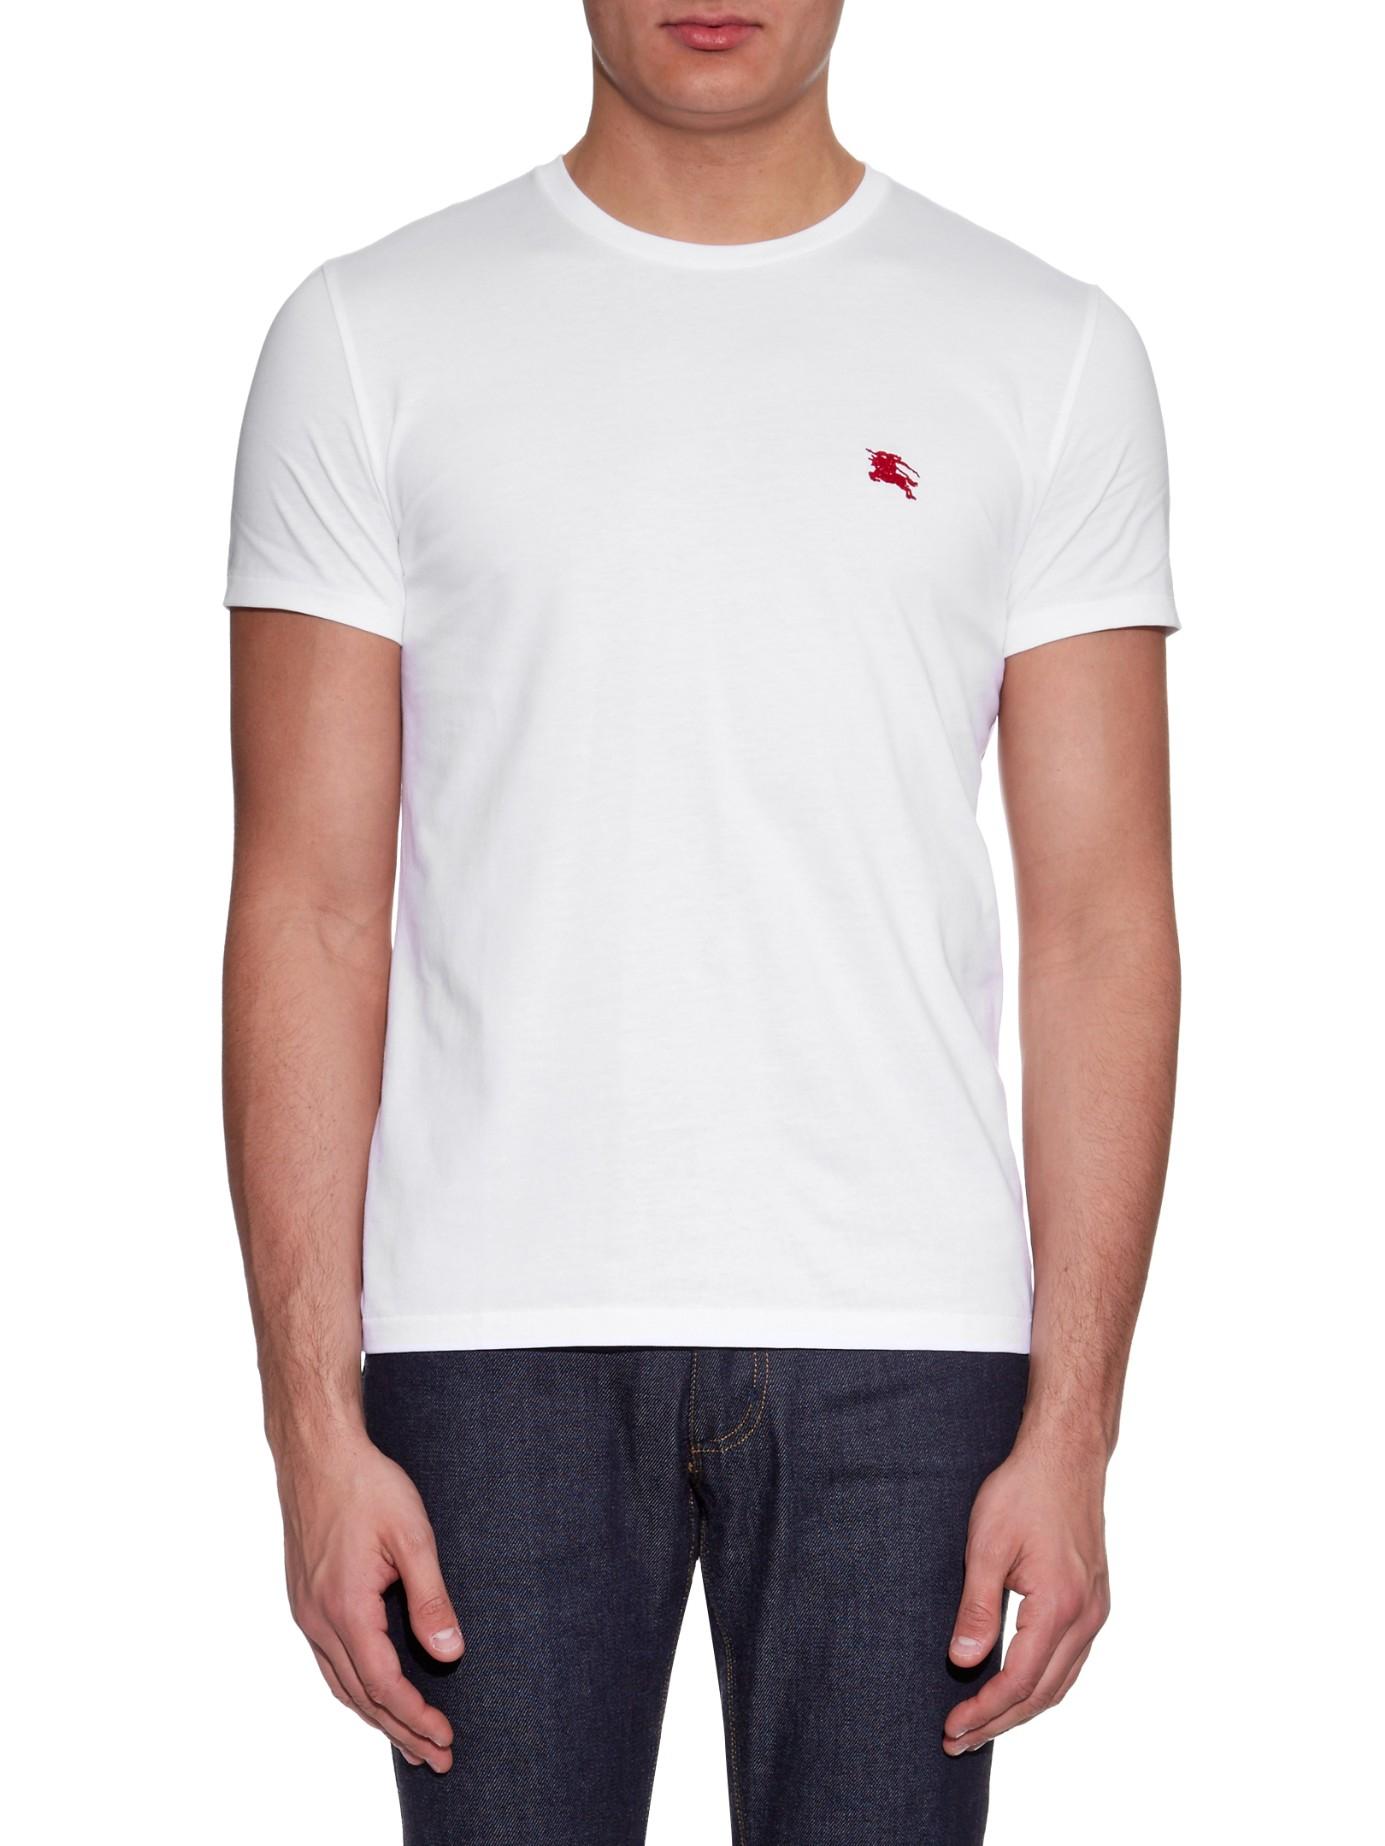 Burberry brit tunworth cotton t shirt in white for men lyst for T shirt burberry men